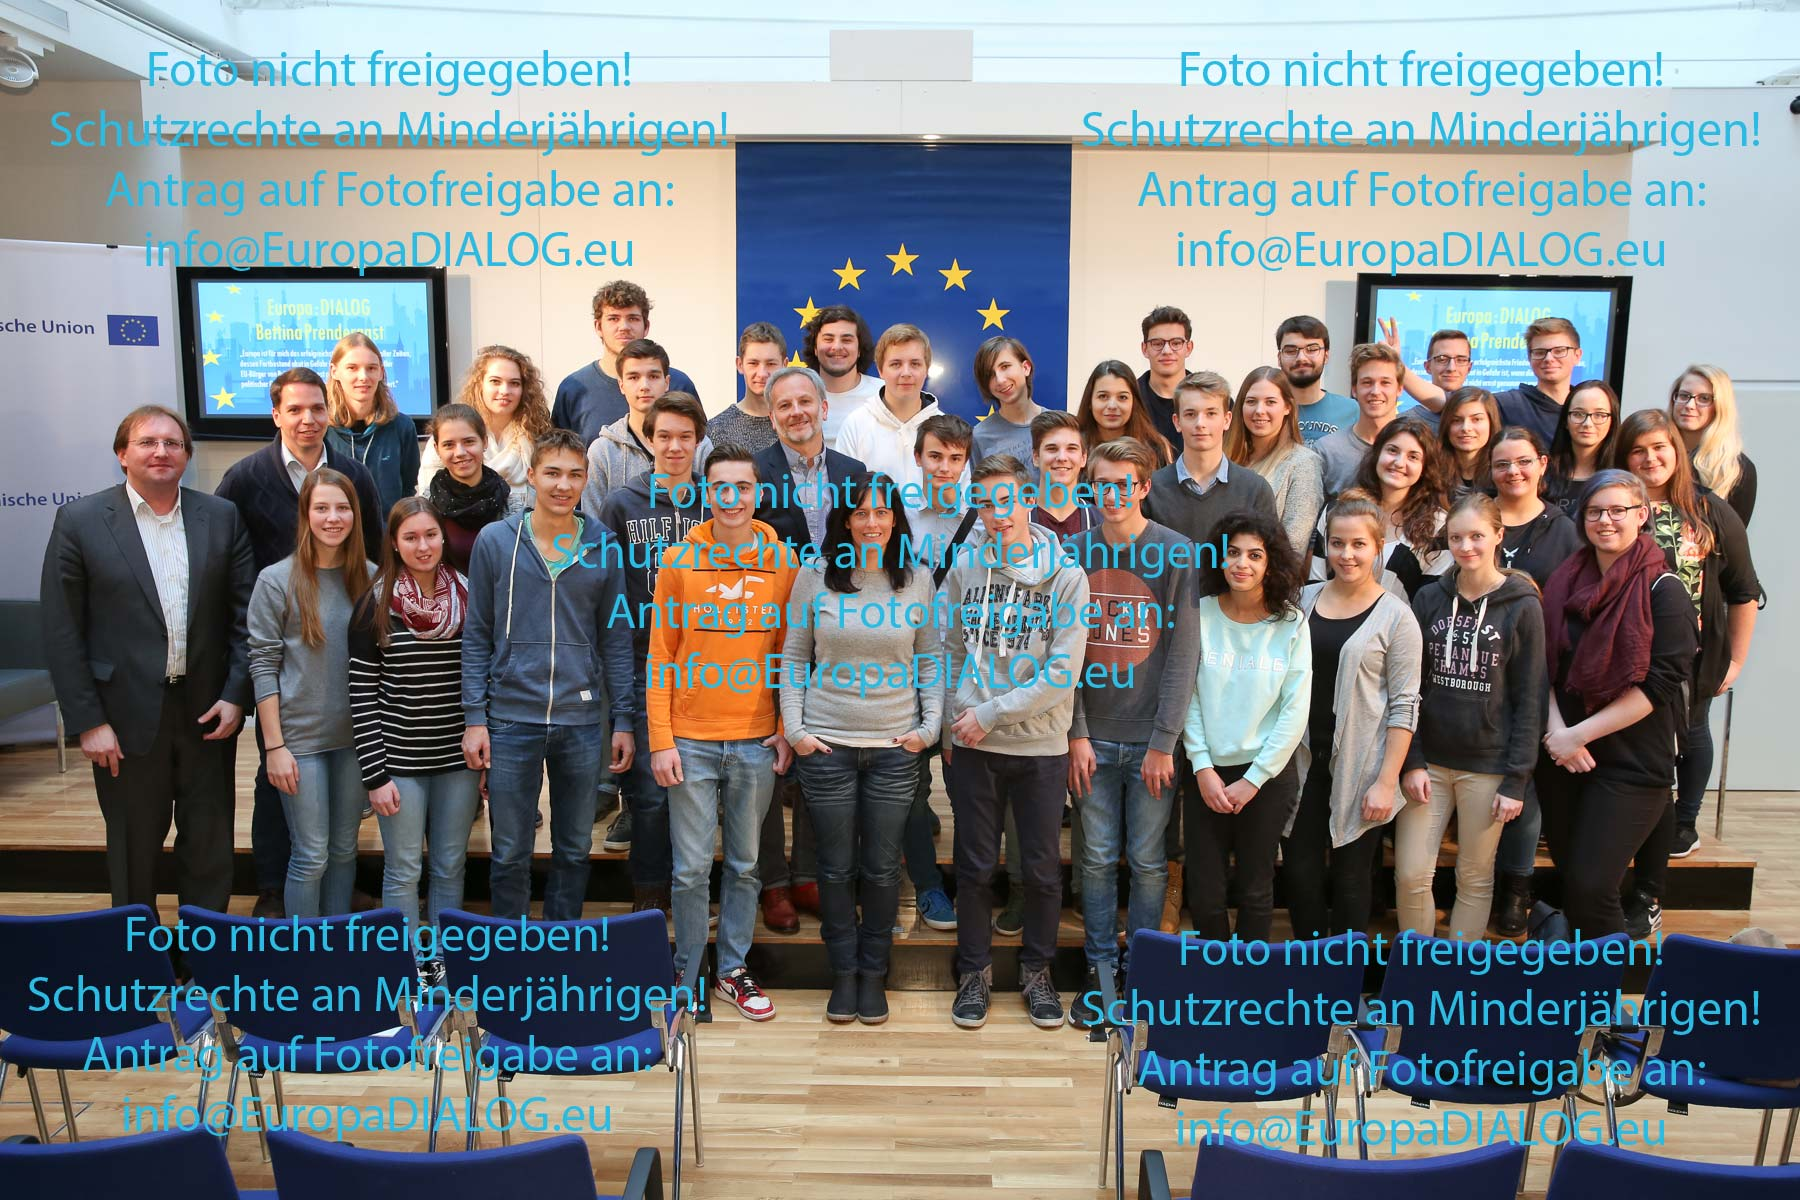 europadialog_bettina-prendergast_s_e10_rg-lambach_081892_-katharina-schiffl__